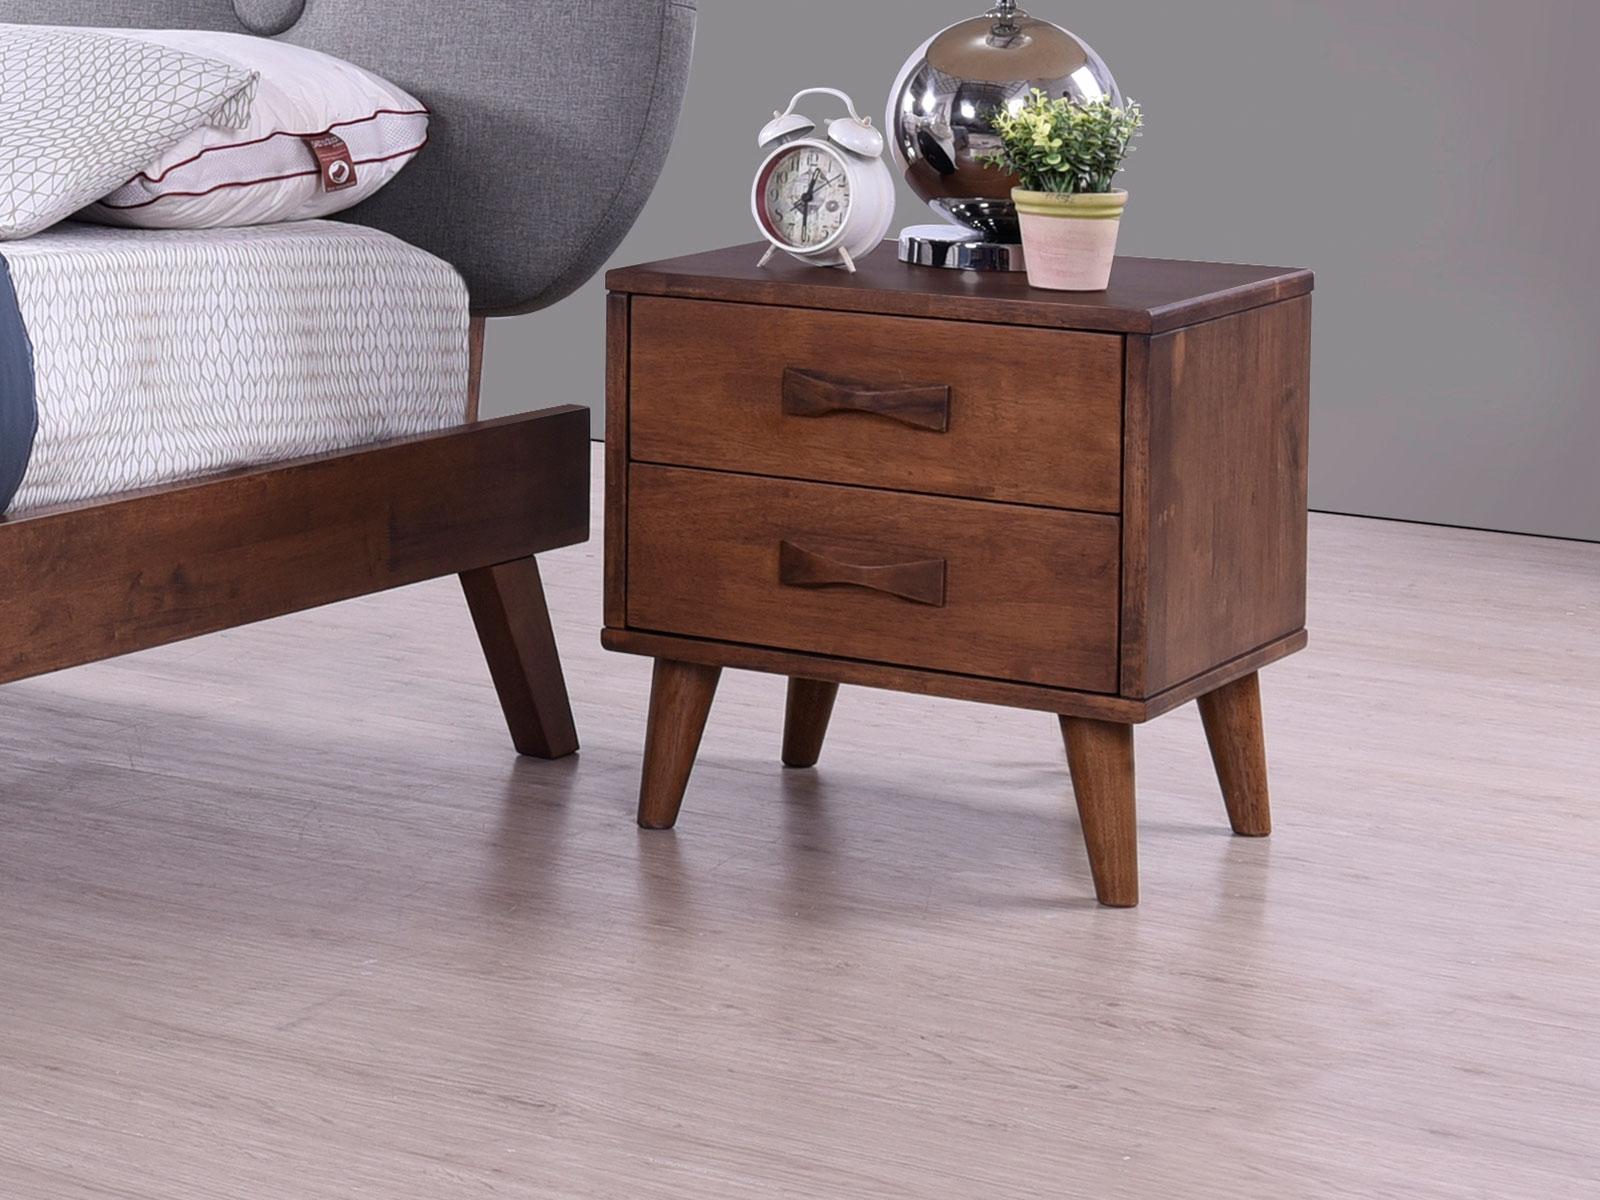 Noptiera din lemn cu 2 usi Emily Grey l58xA40xH56 cm